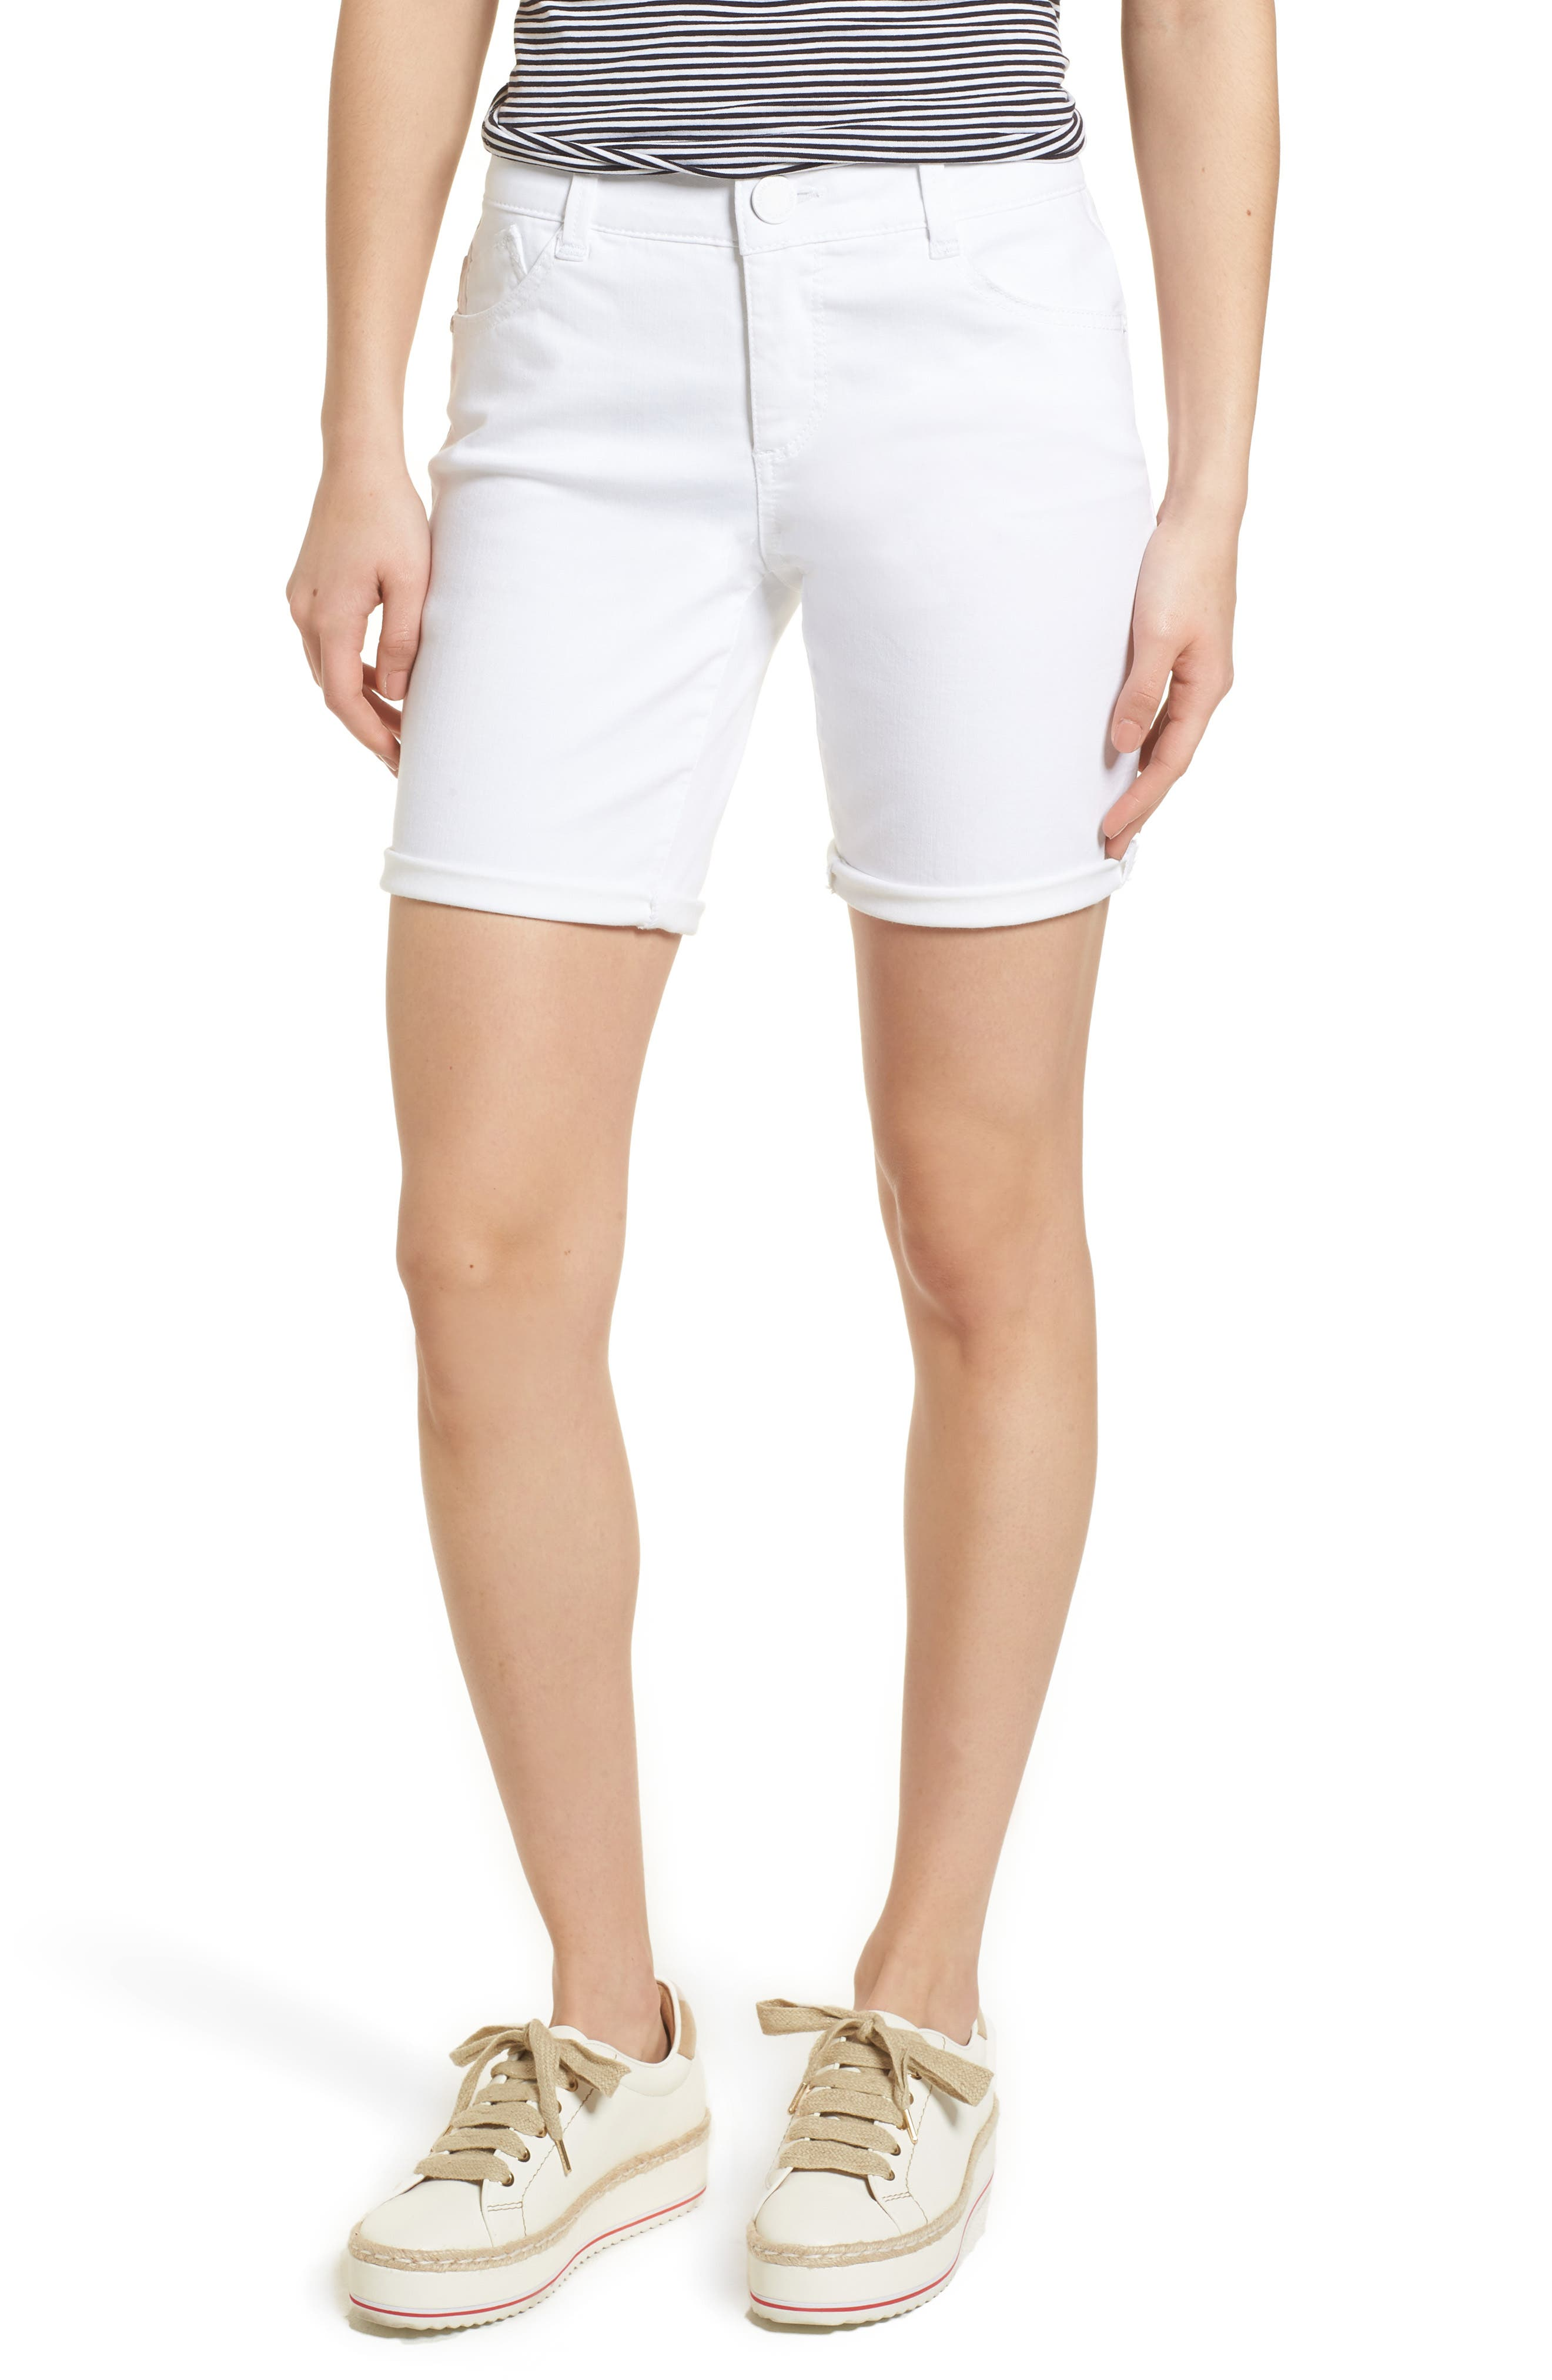 WIT & WISDOM Ab-Solution White Denim Shorts, Main, color, OPTIC WHITE